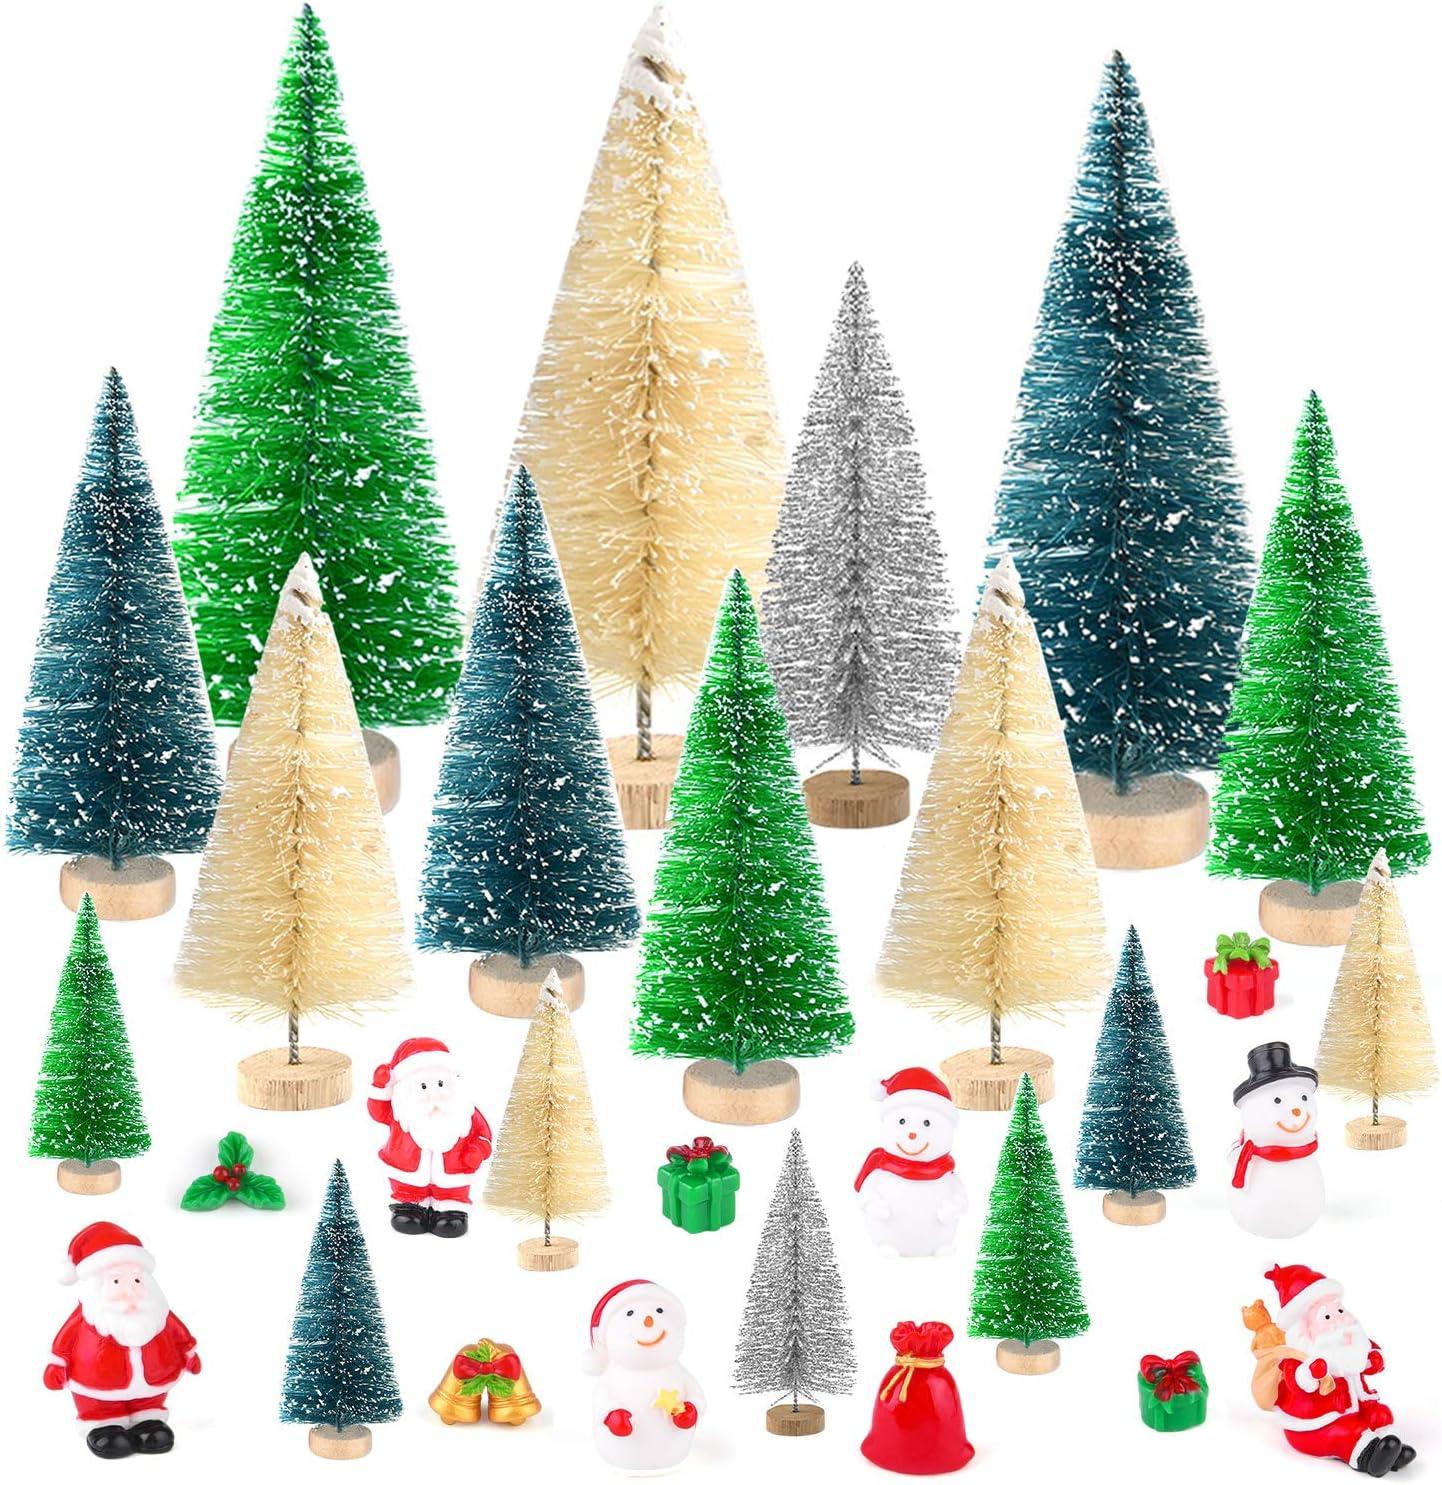 KUUQA 29 Pcs Mini Sisal Snow Frost Trees Bottle Brush Trees Mini Christmas Trees with Figures Santa Claus, Snowman, Boxes Miniature Ornaments for Christmas Village Decoration, Xmas Party Decor